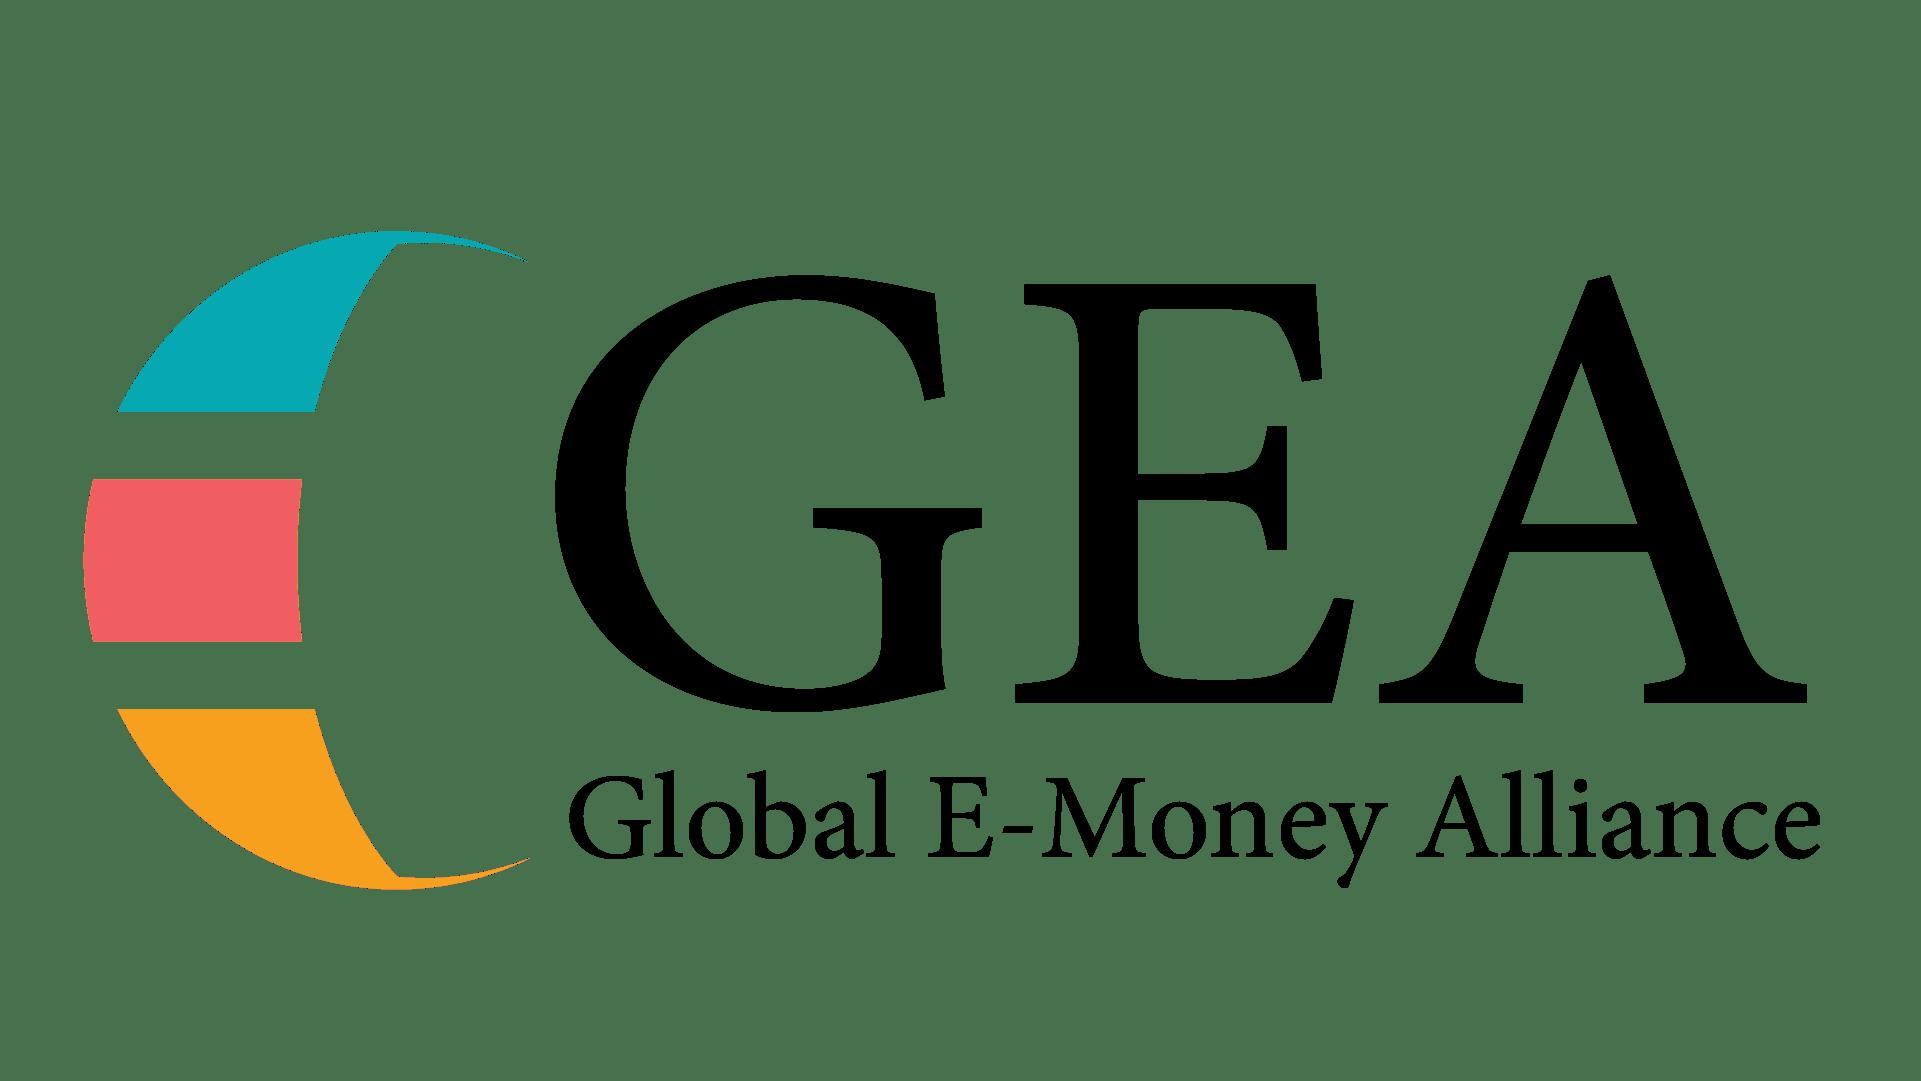 global e money alliance crunchbase company profile funding global e money alliance crunchbase